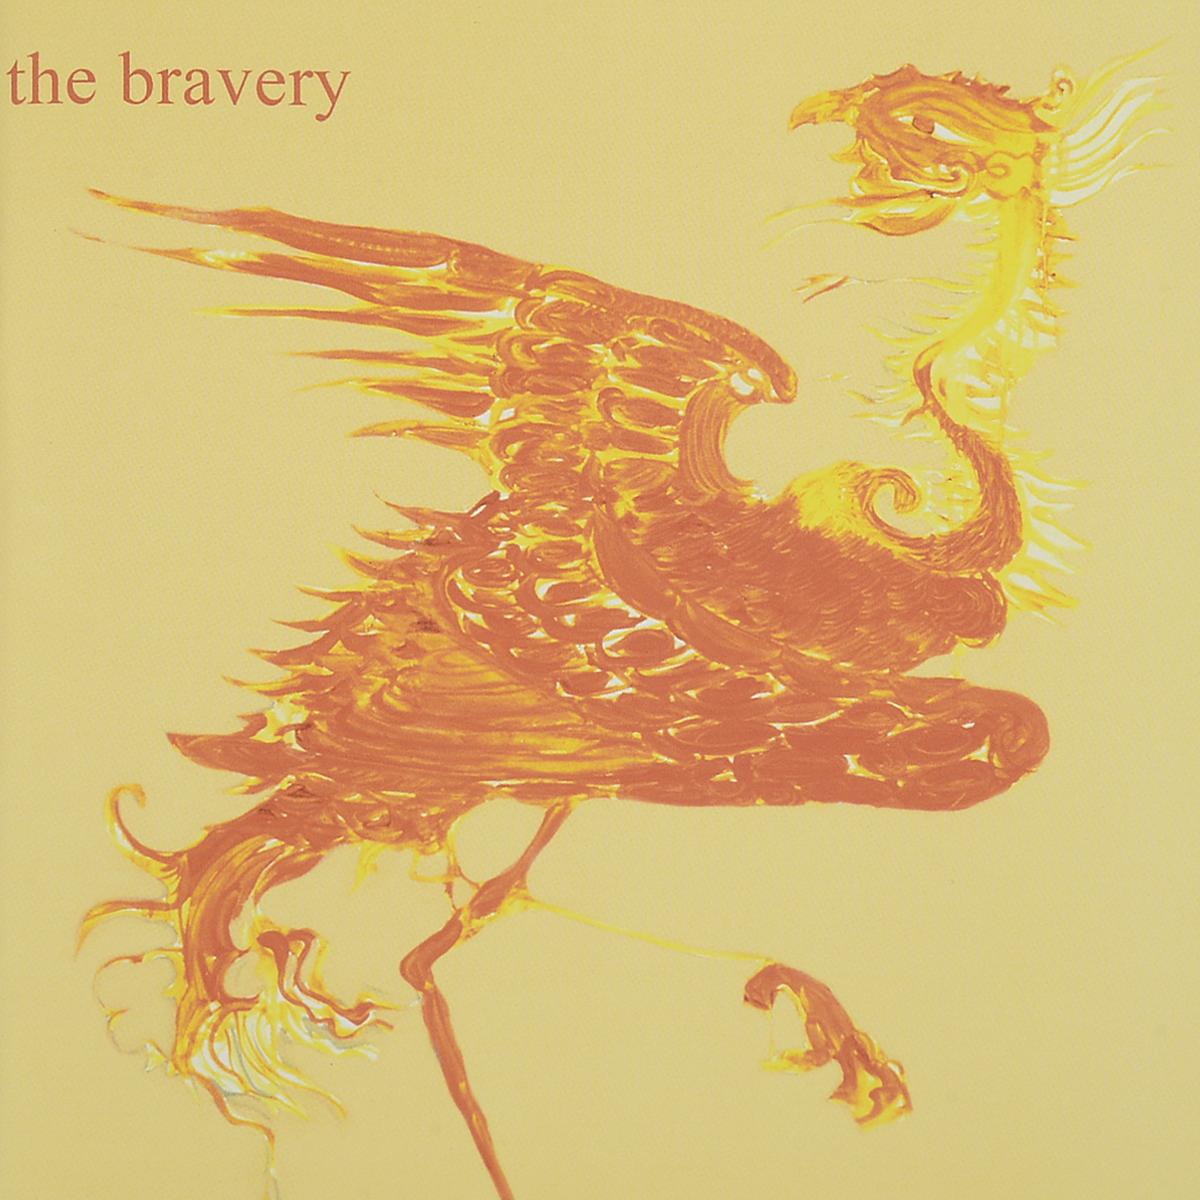 The Bravery The Bravery. The Bravery jam jam the gift